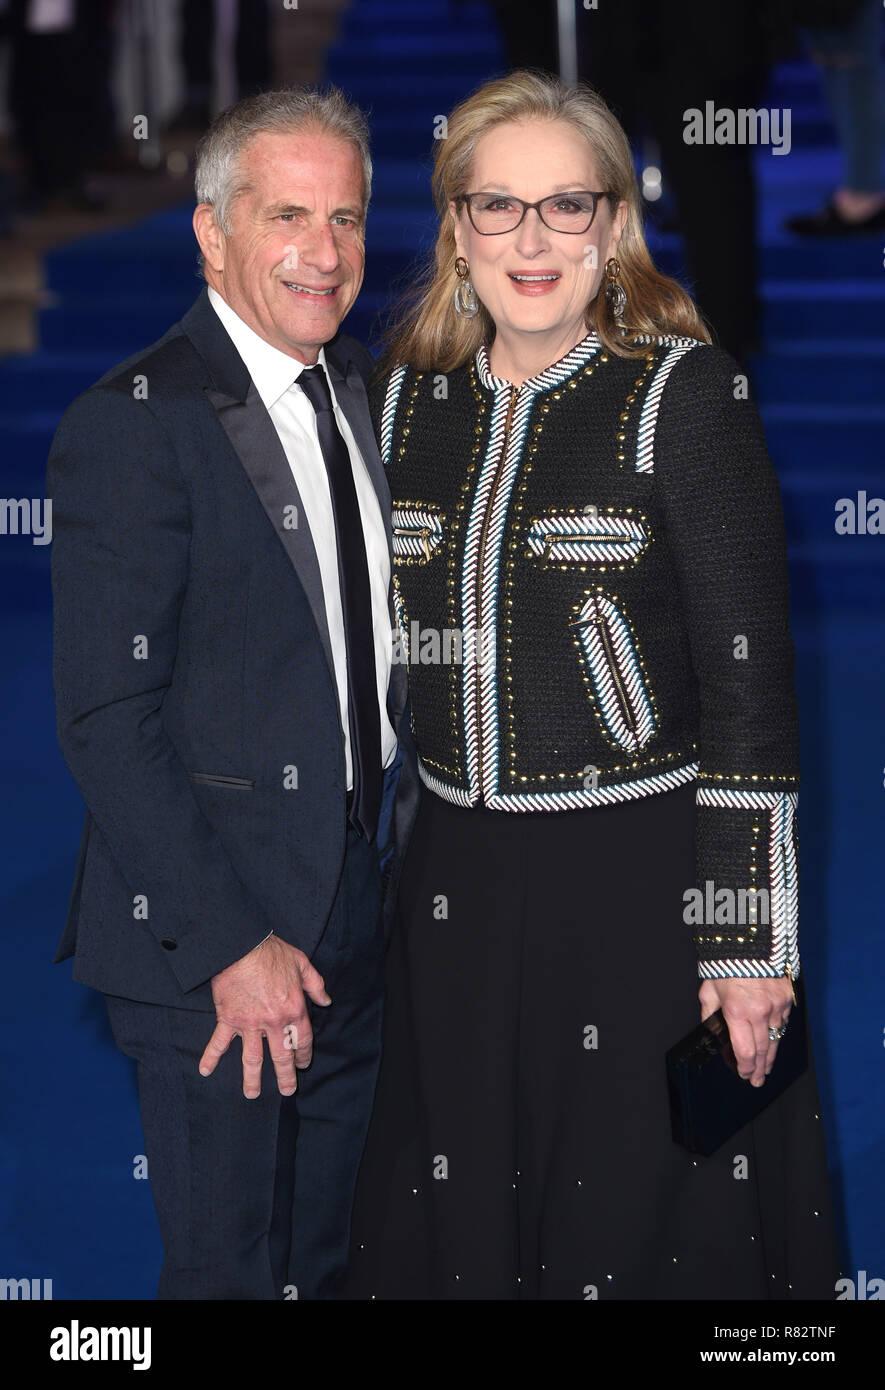 Photo Must Be Credited ©Alpha Press 079965 12/12/2018 Marc Platt and Meryl Streep Mary Poppins Returns European Premiere at The Royal Albert London - Stock Image